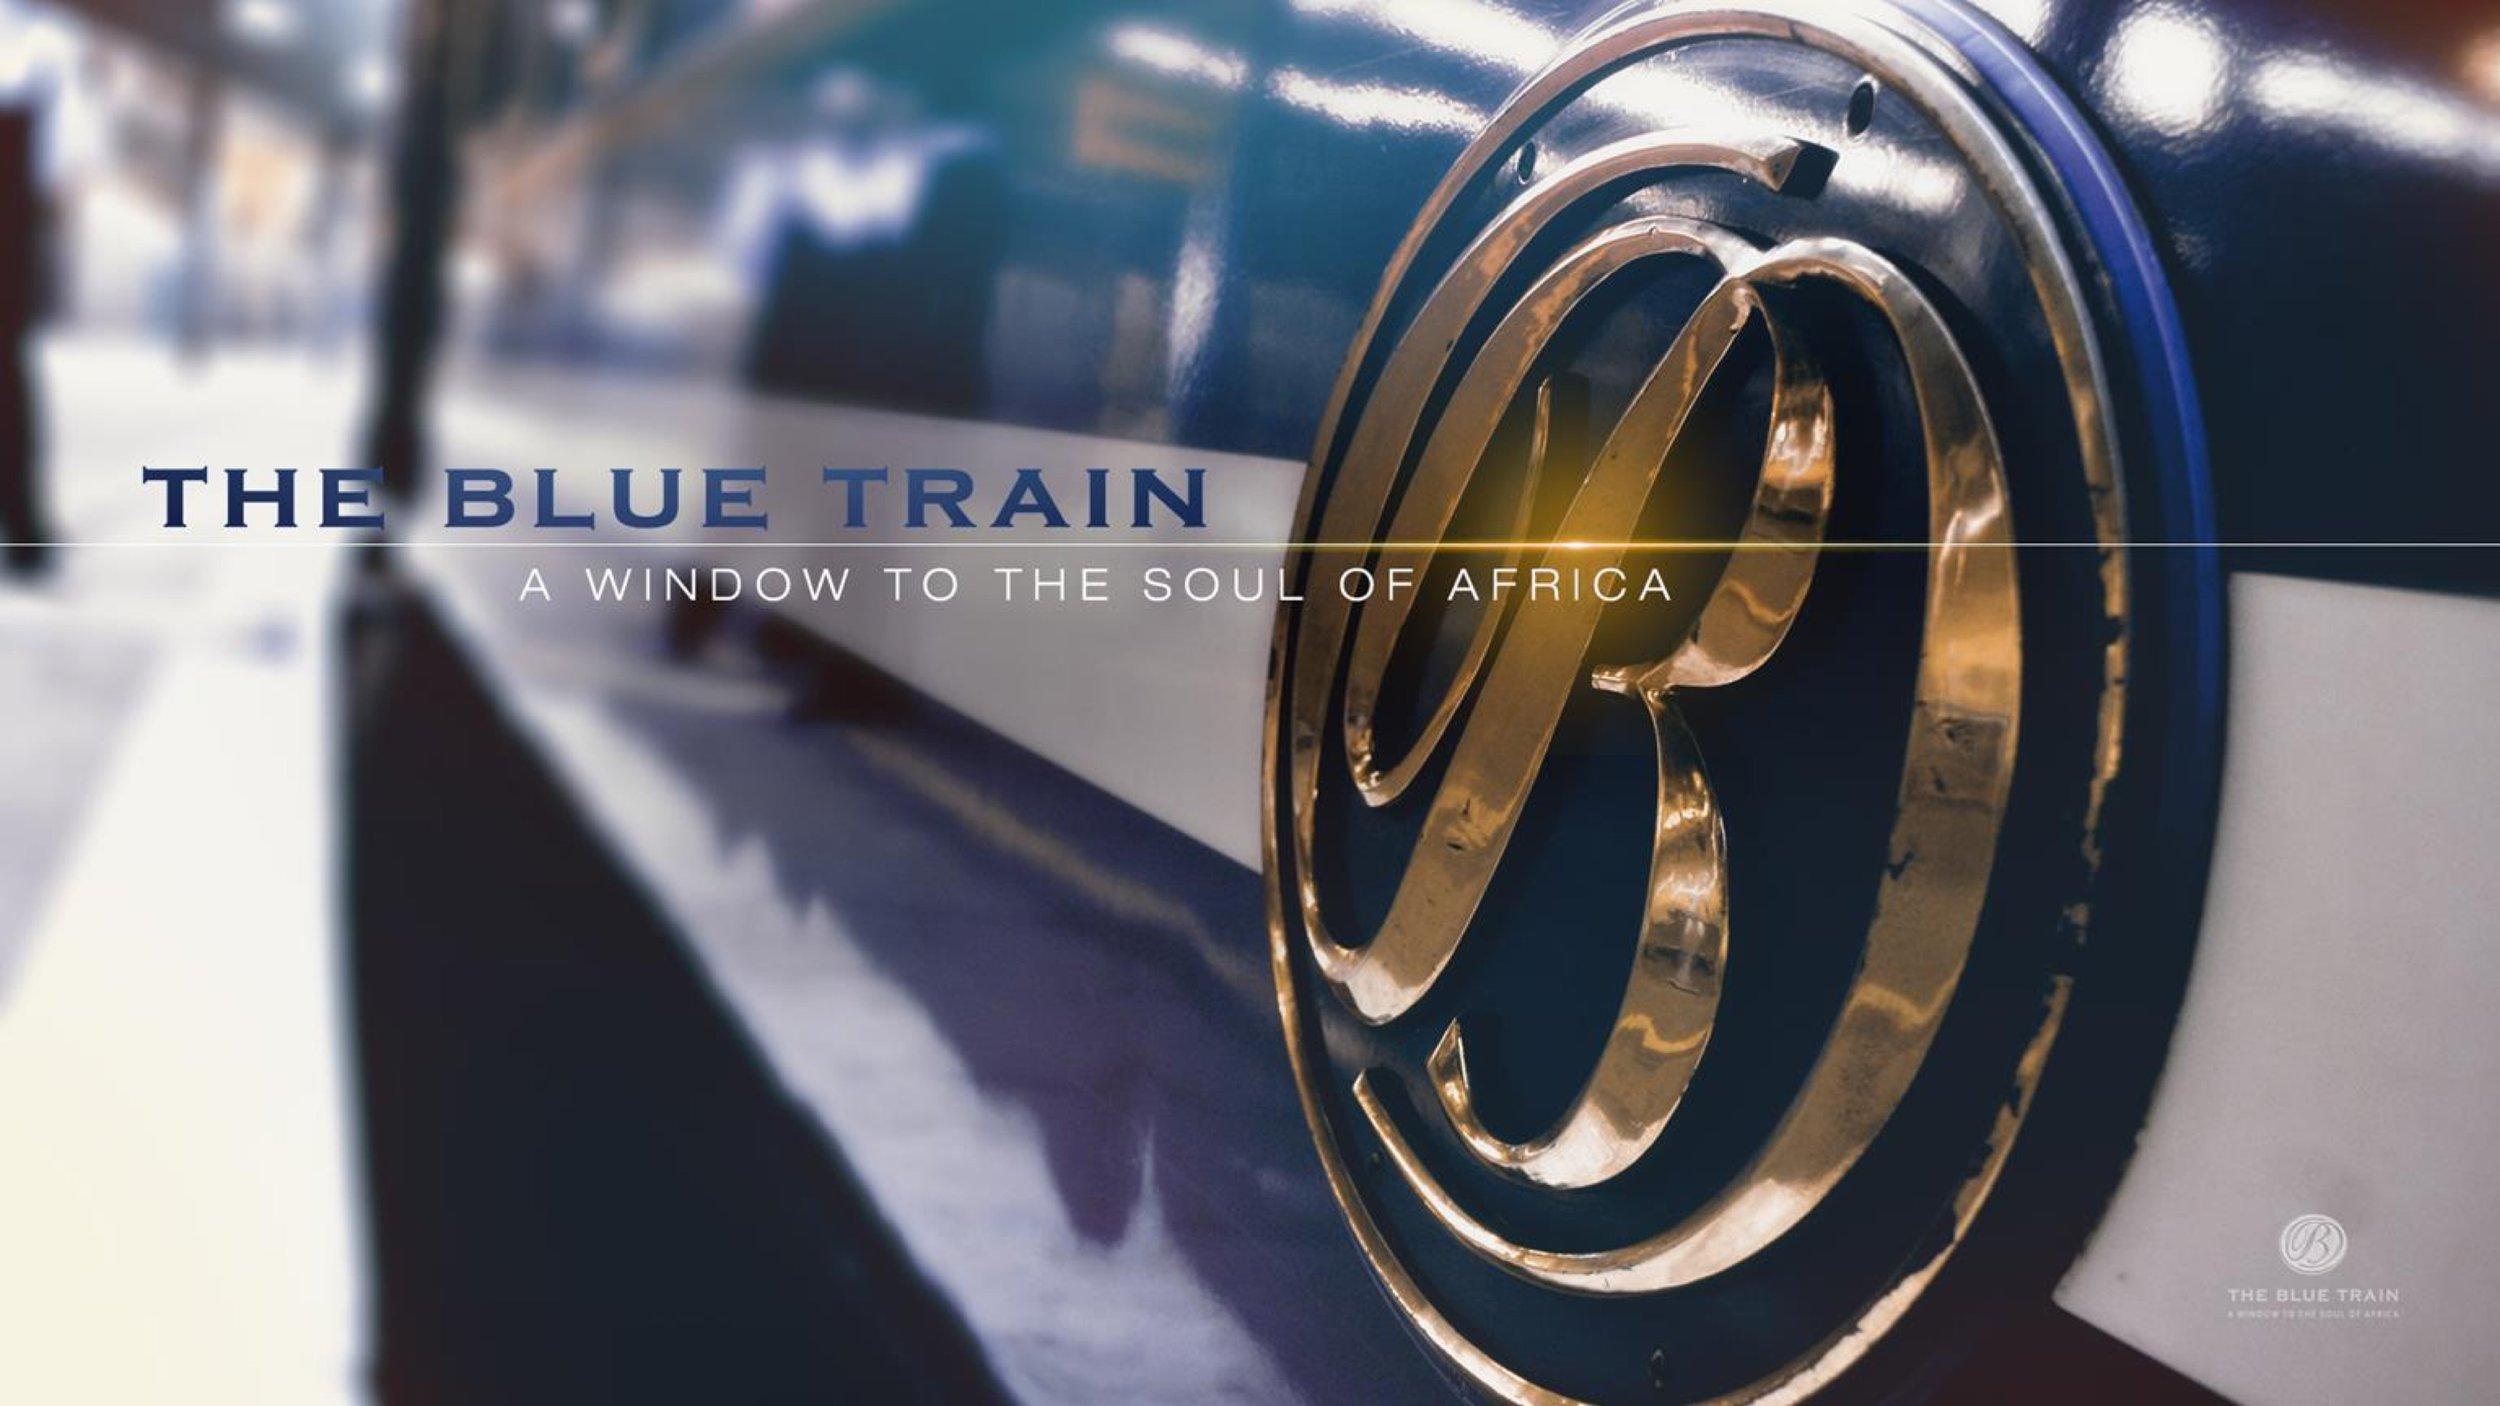 The Blue Train Presents - The Coltrane Documentary Premiere FINAL DRAFT_8 Feb 2017.jpeg